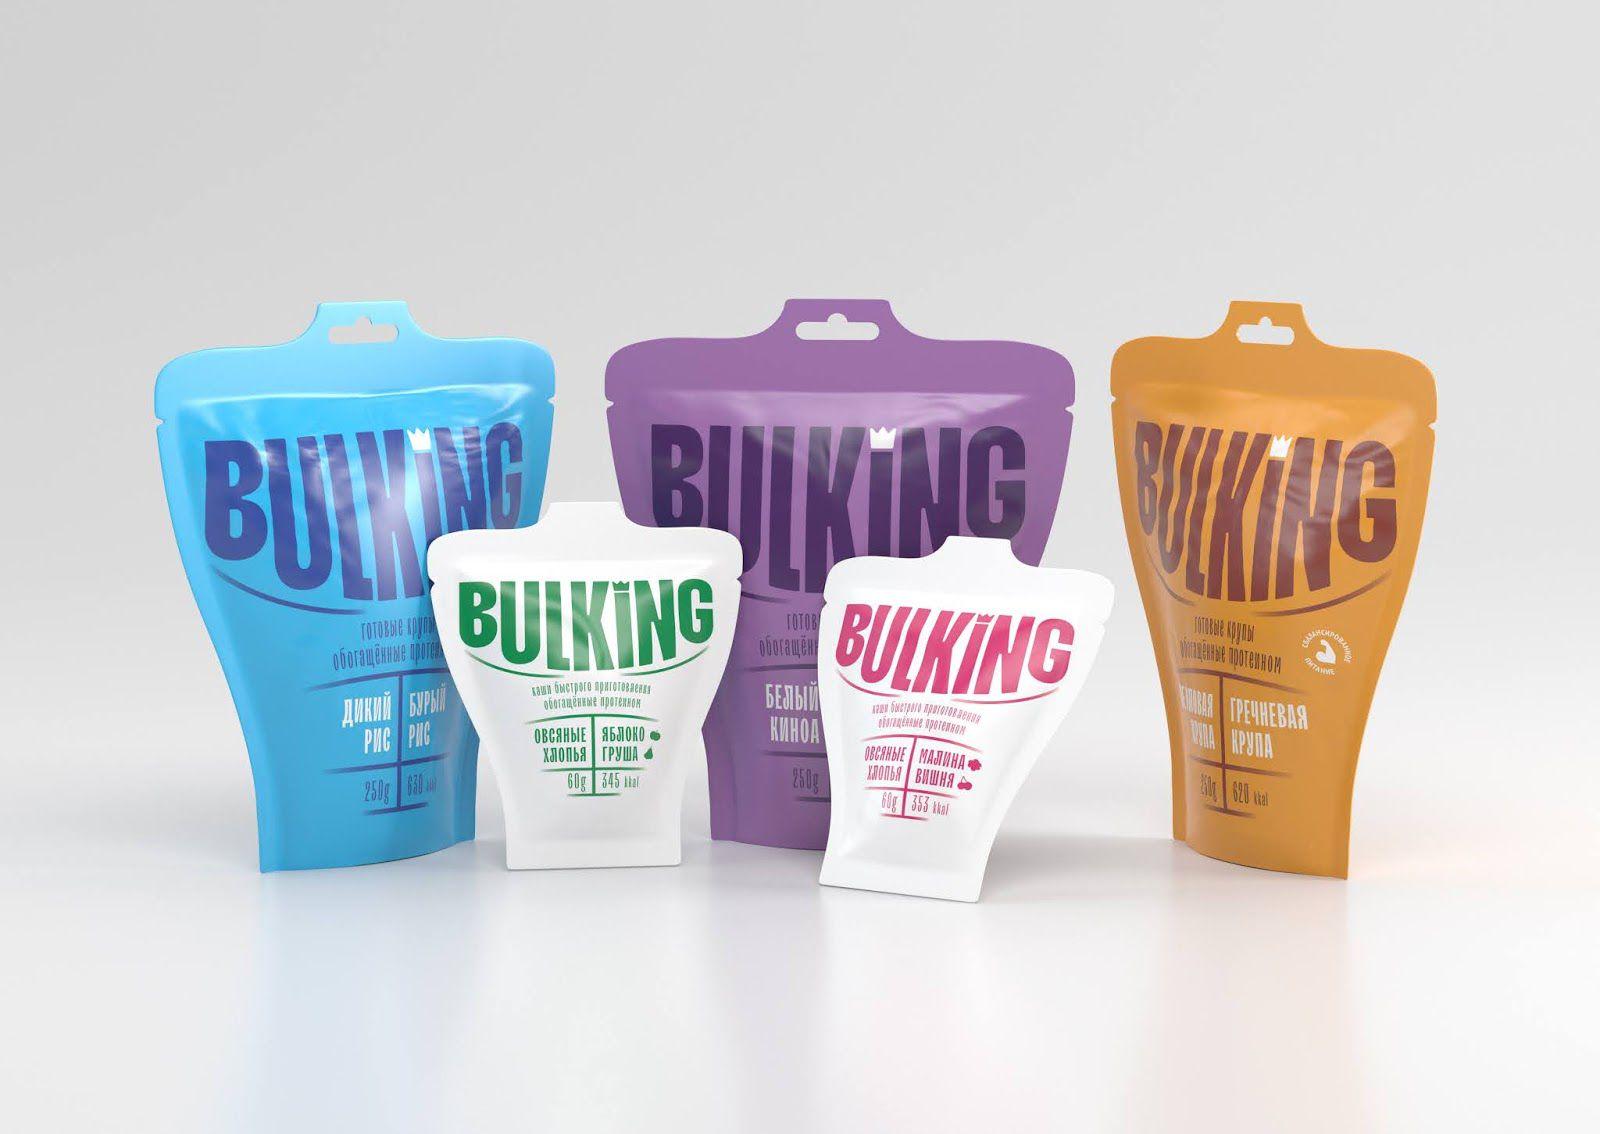 Bulking (alimentation protéinée) I Design : Nikita Gavrilov (HSE ART AND DESIGN SCHOOL), Russie (août 2020)